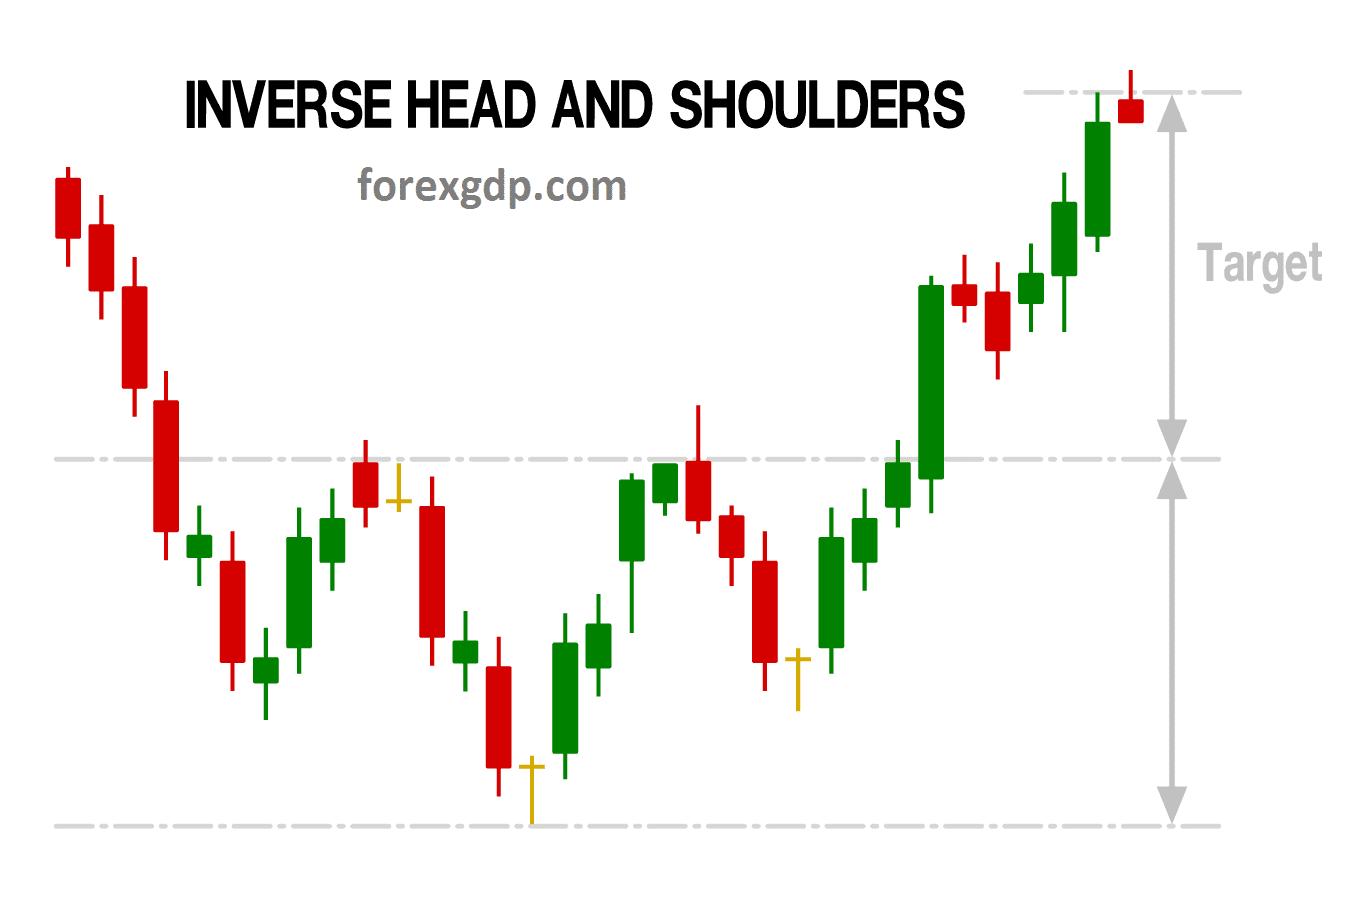 Inverse Head and Shoulder Take profit target